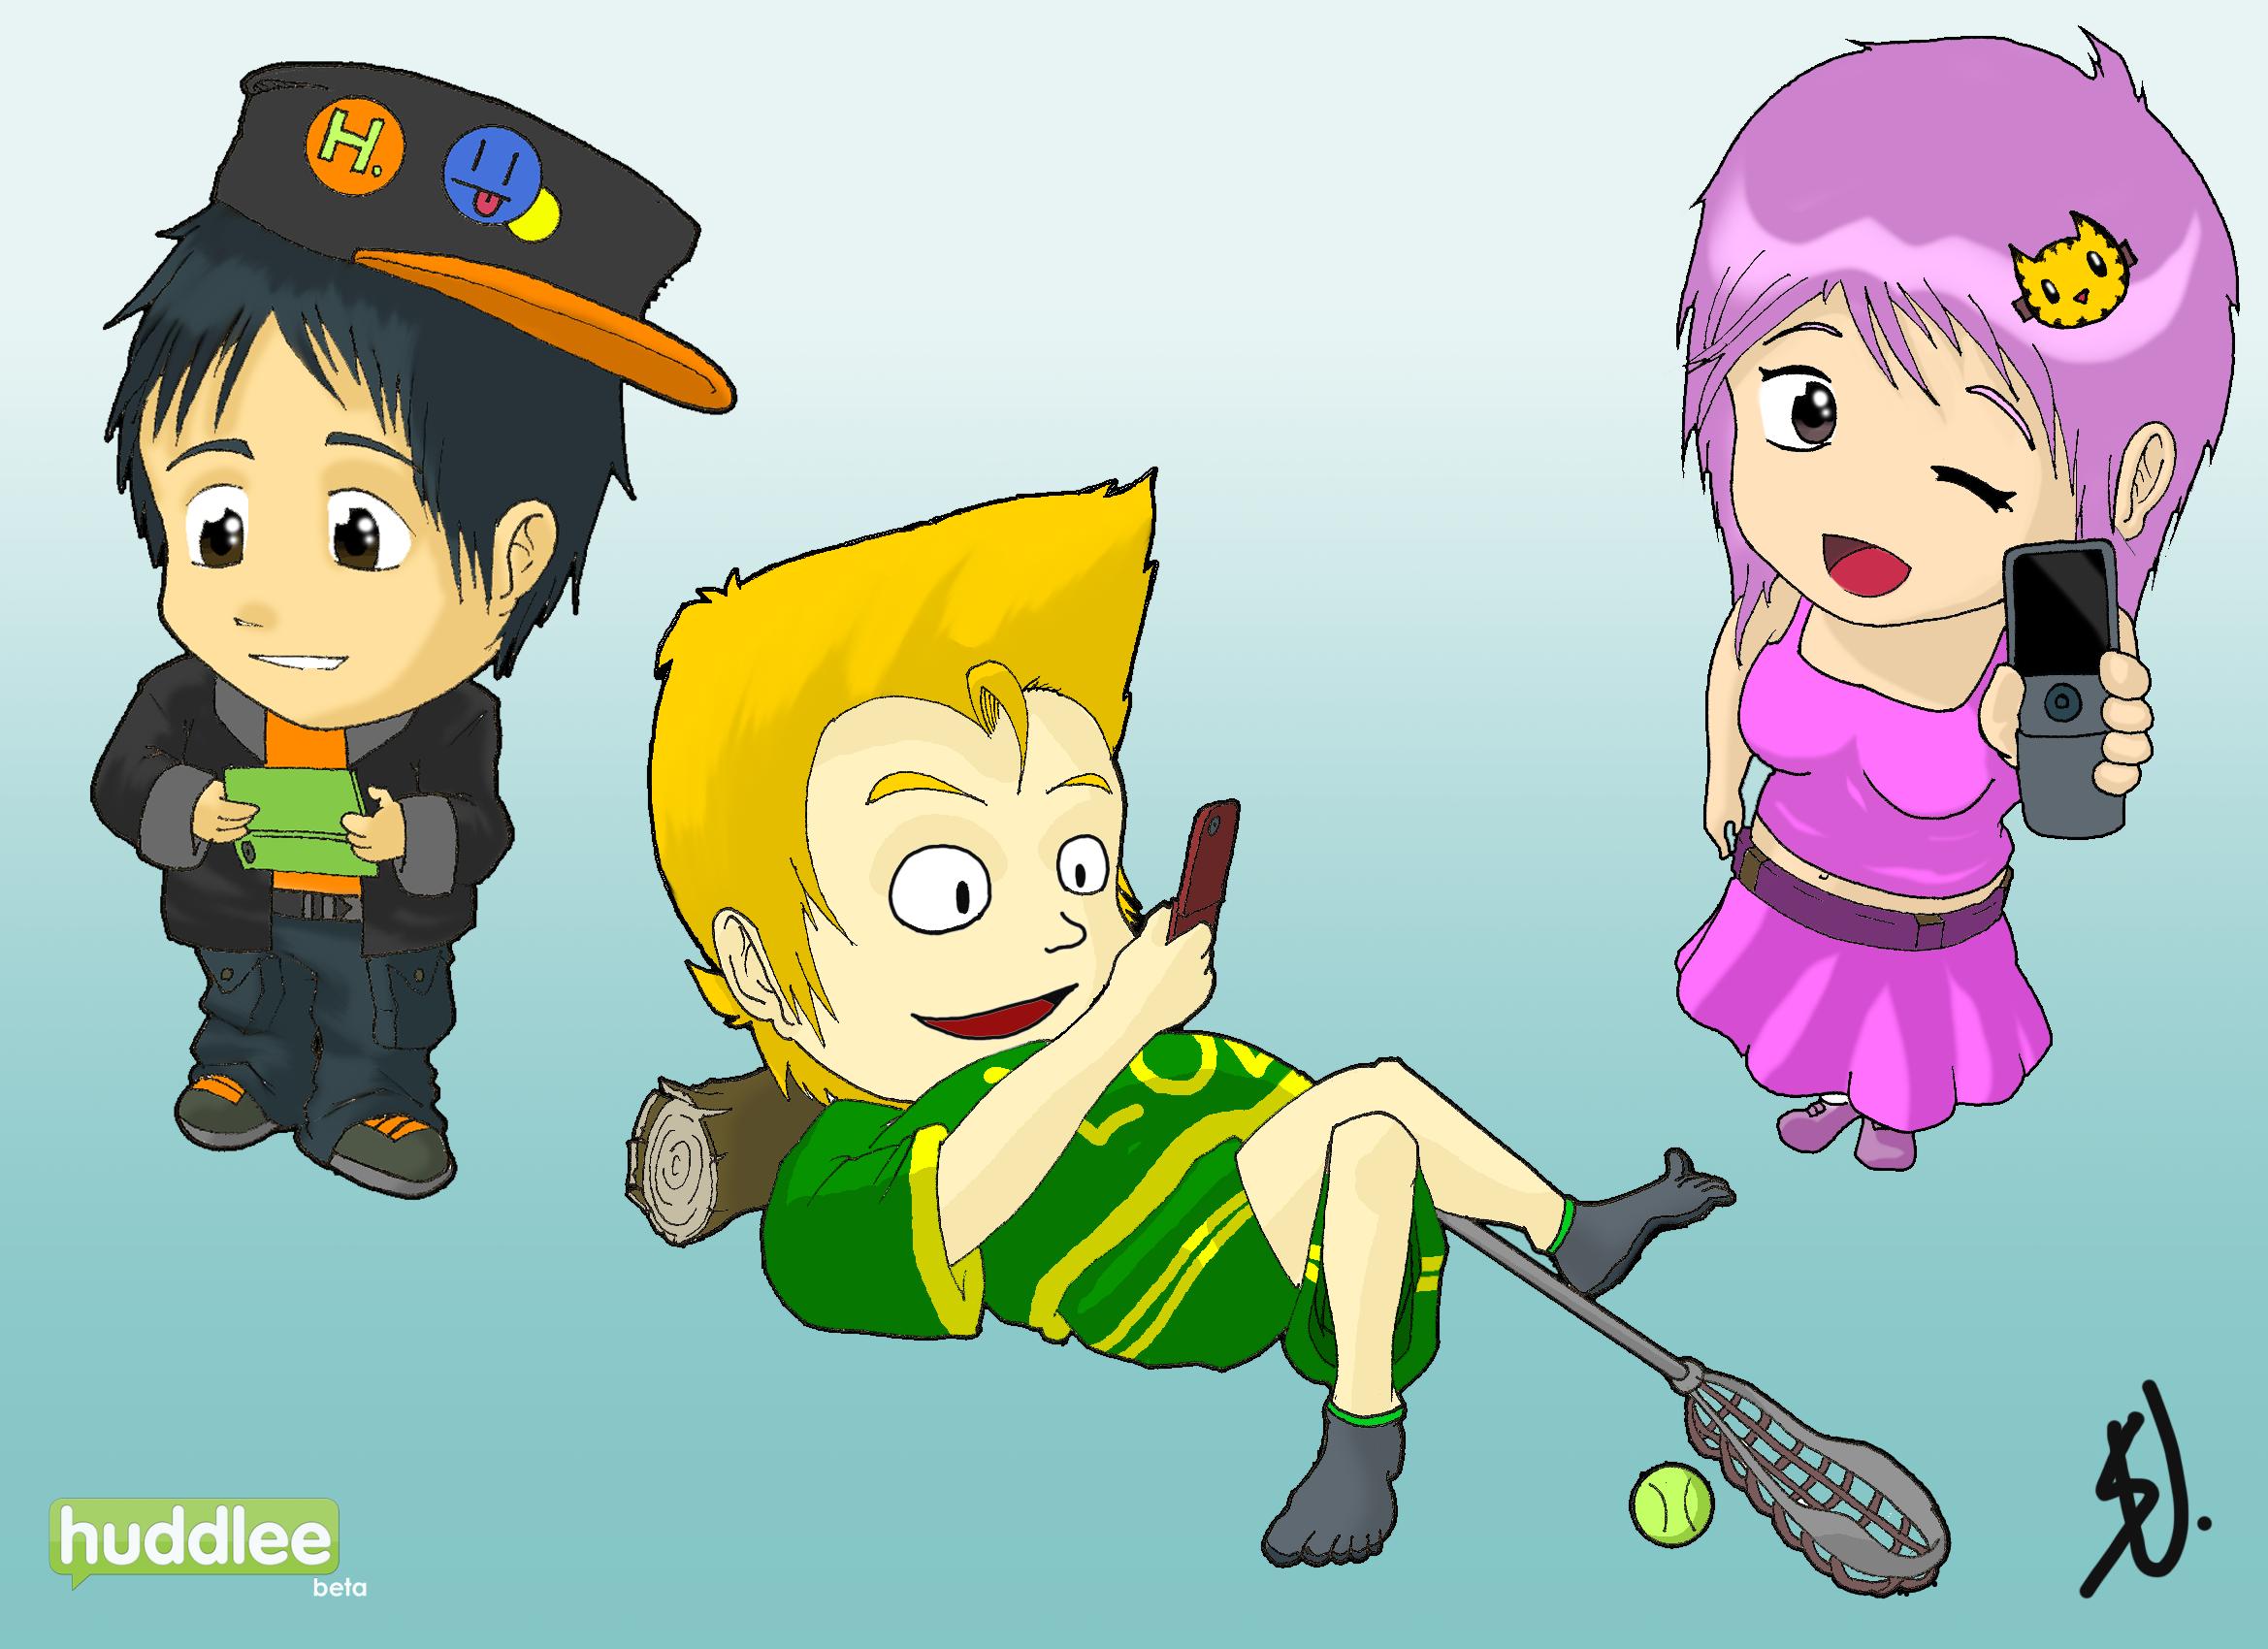 Huddlee Characters